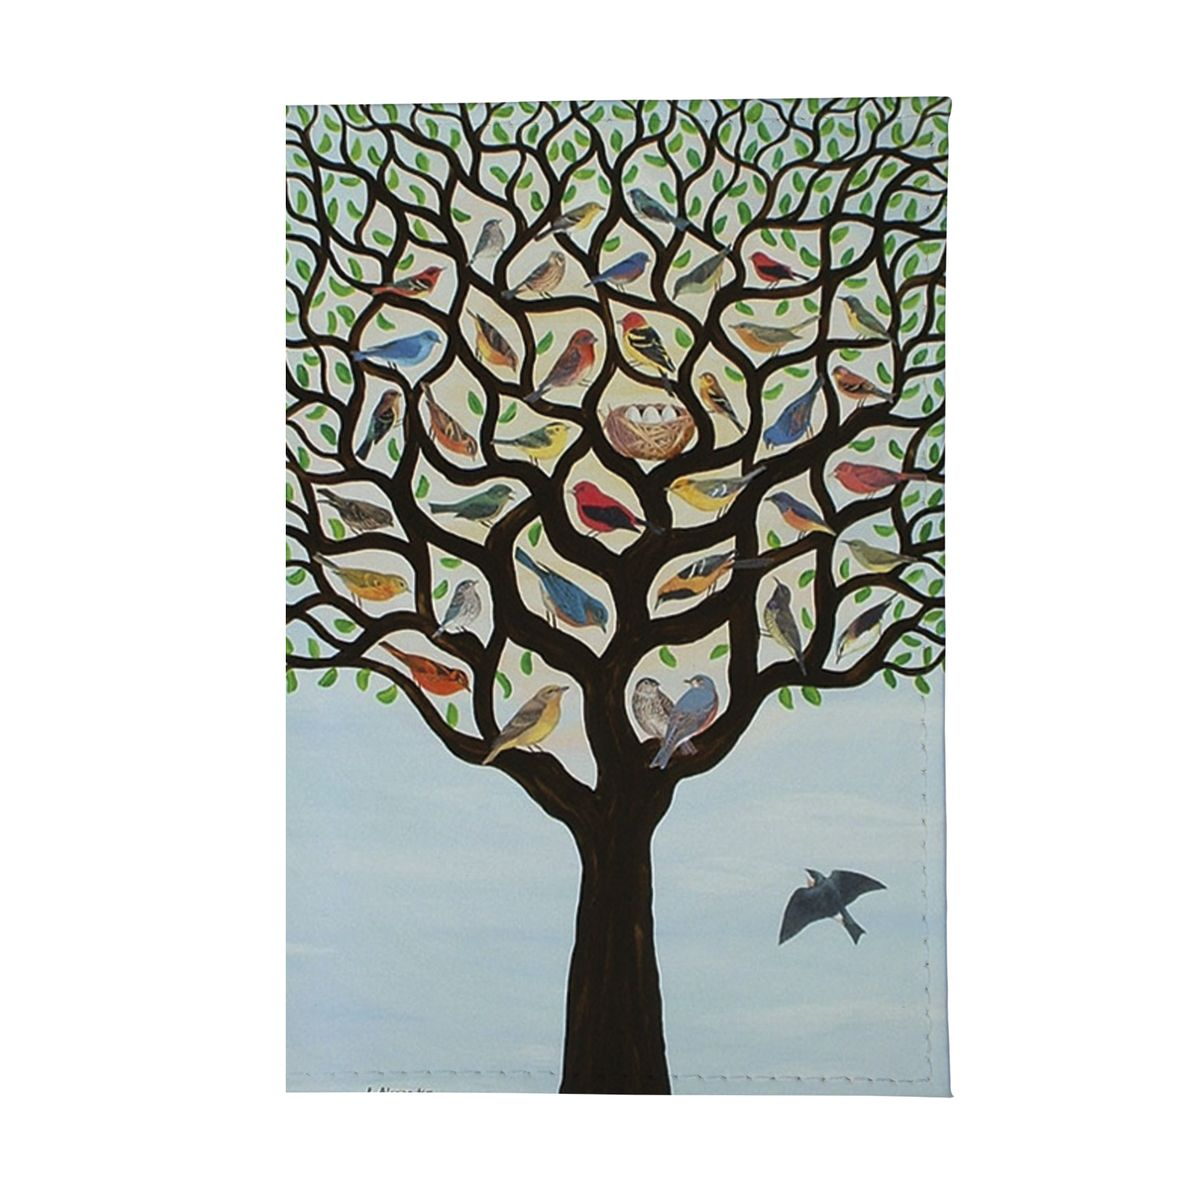 Обложка для автодокументов Дерево с птичками Арт. AUTOZAM117ПВХ (поливинилхлорид)